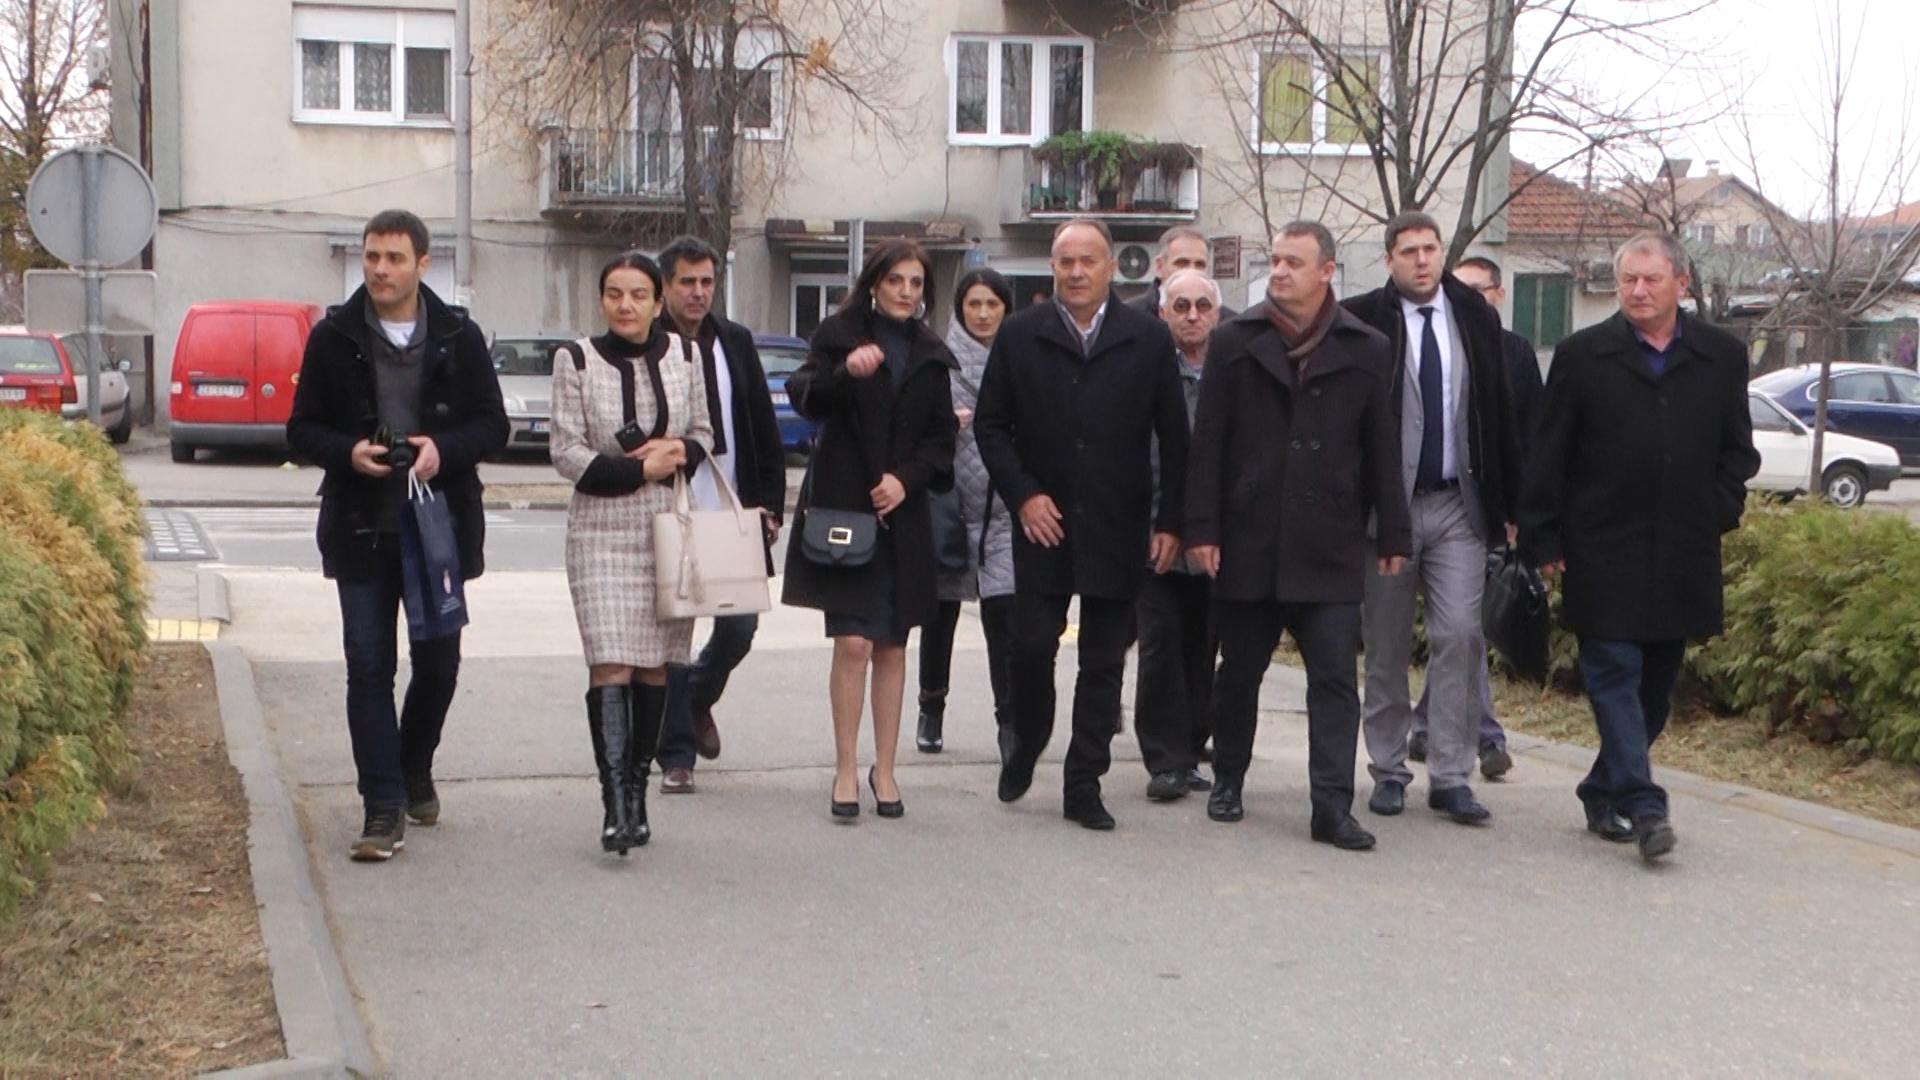 Ministar prosvete Mladen Šarčević posetio je opštinu Kladovo